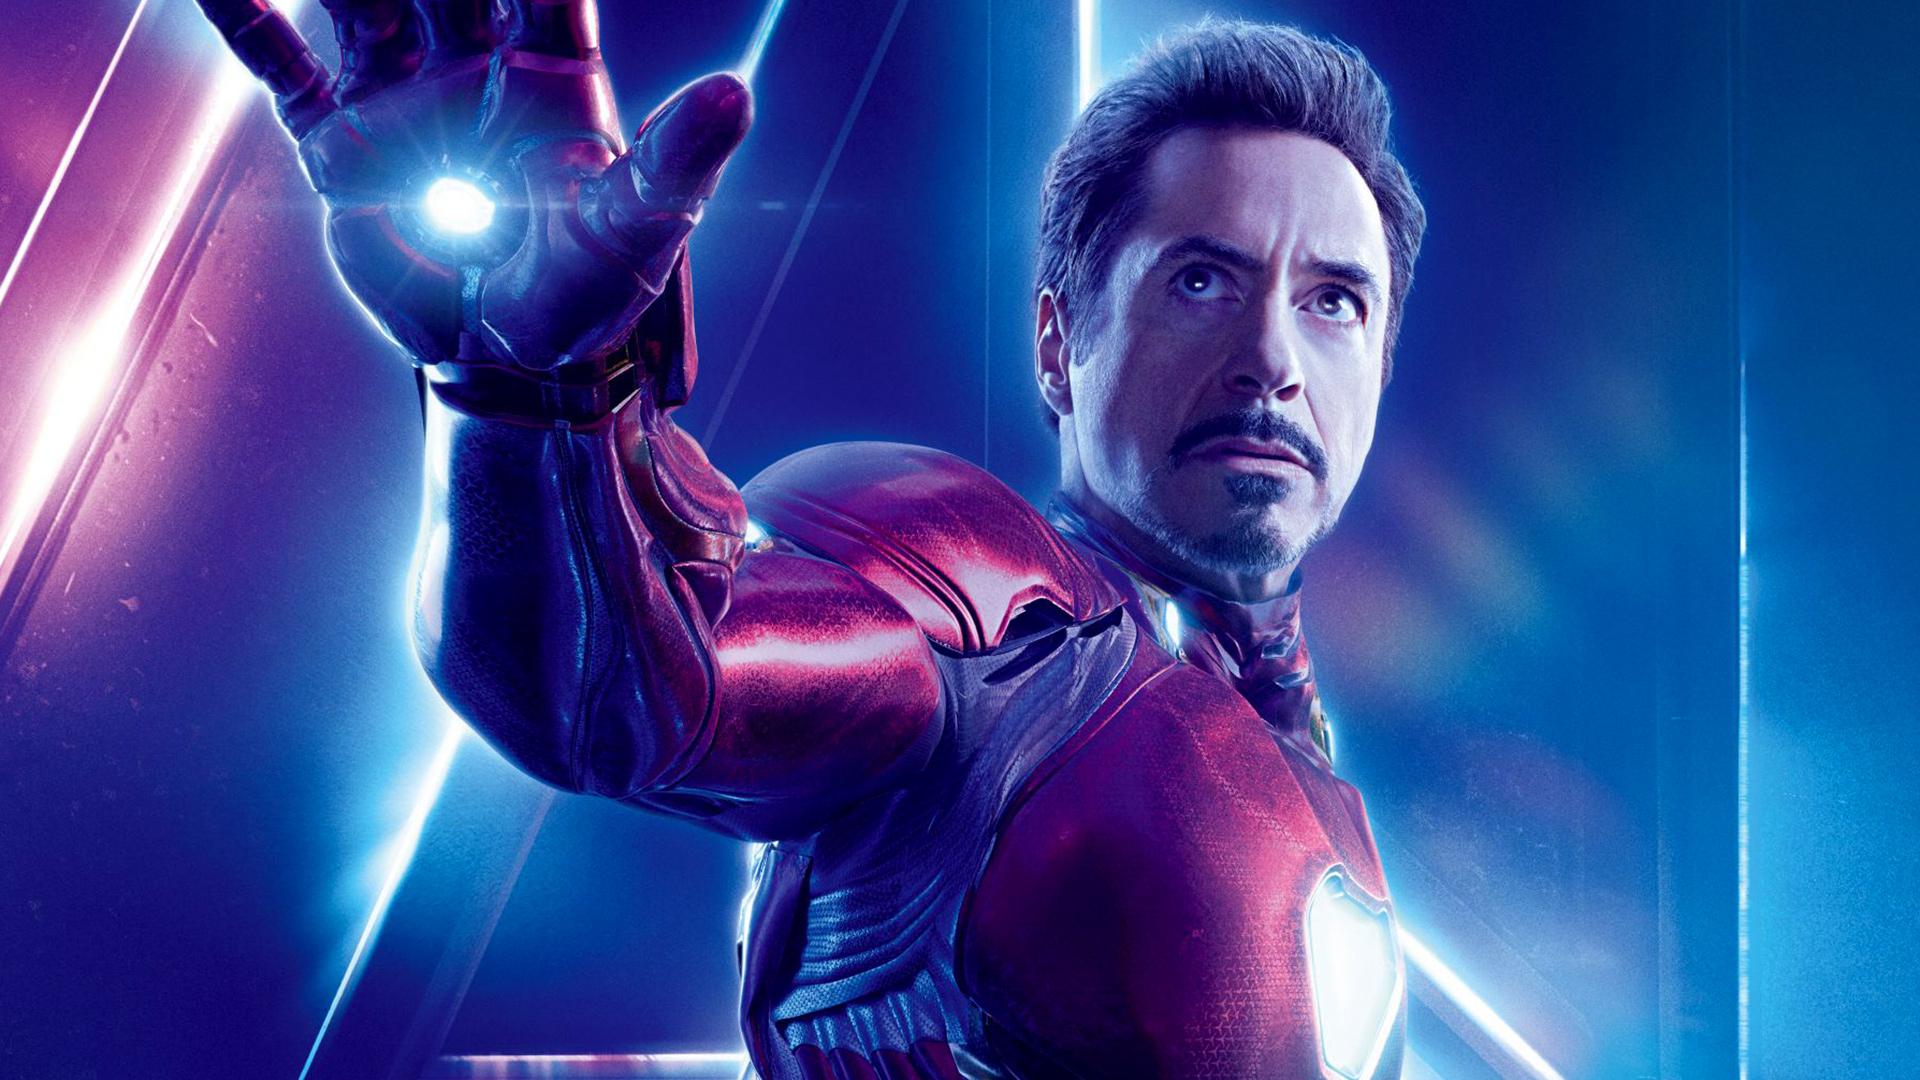 Avengers Endgame La Memorabile Battuta Finale Di Iron Man